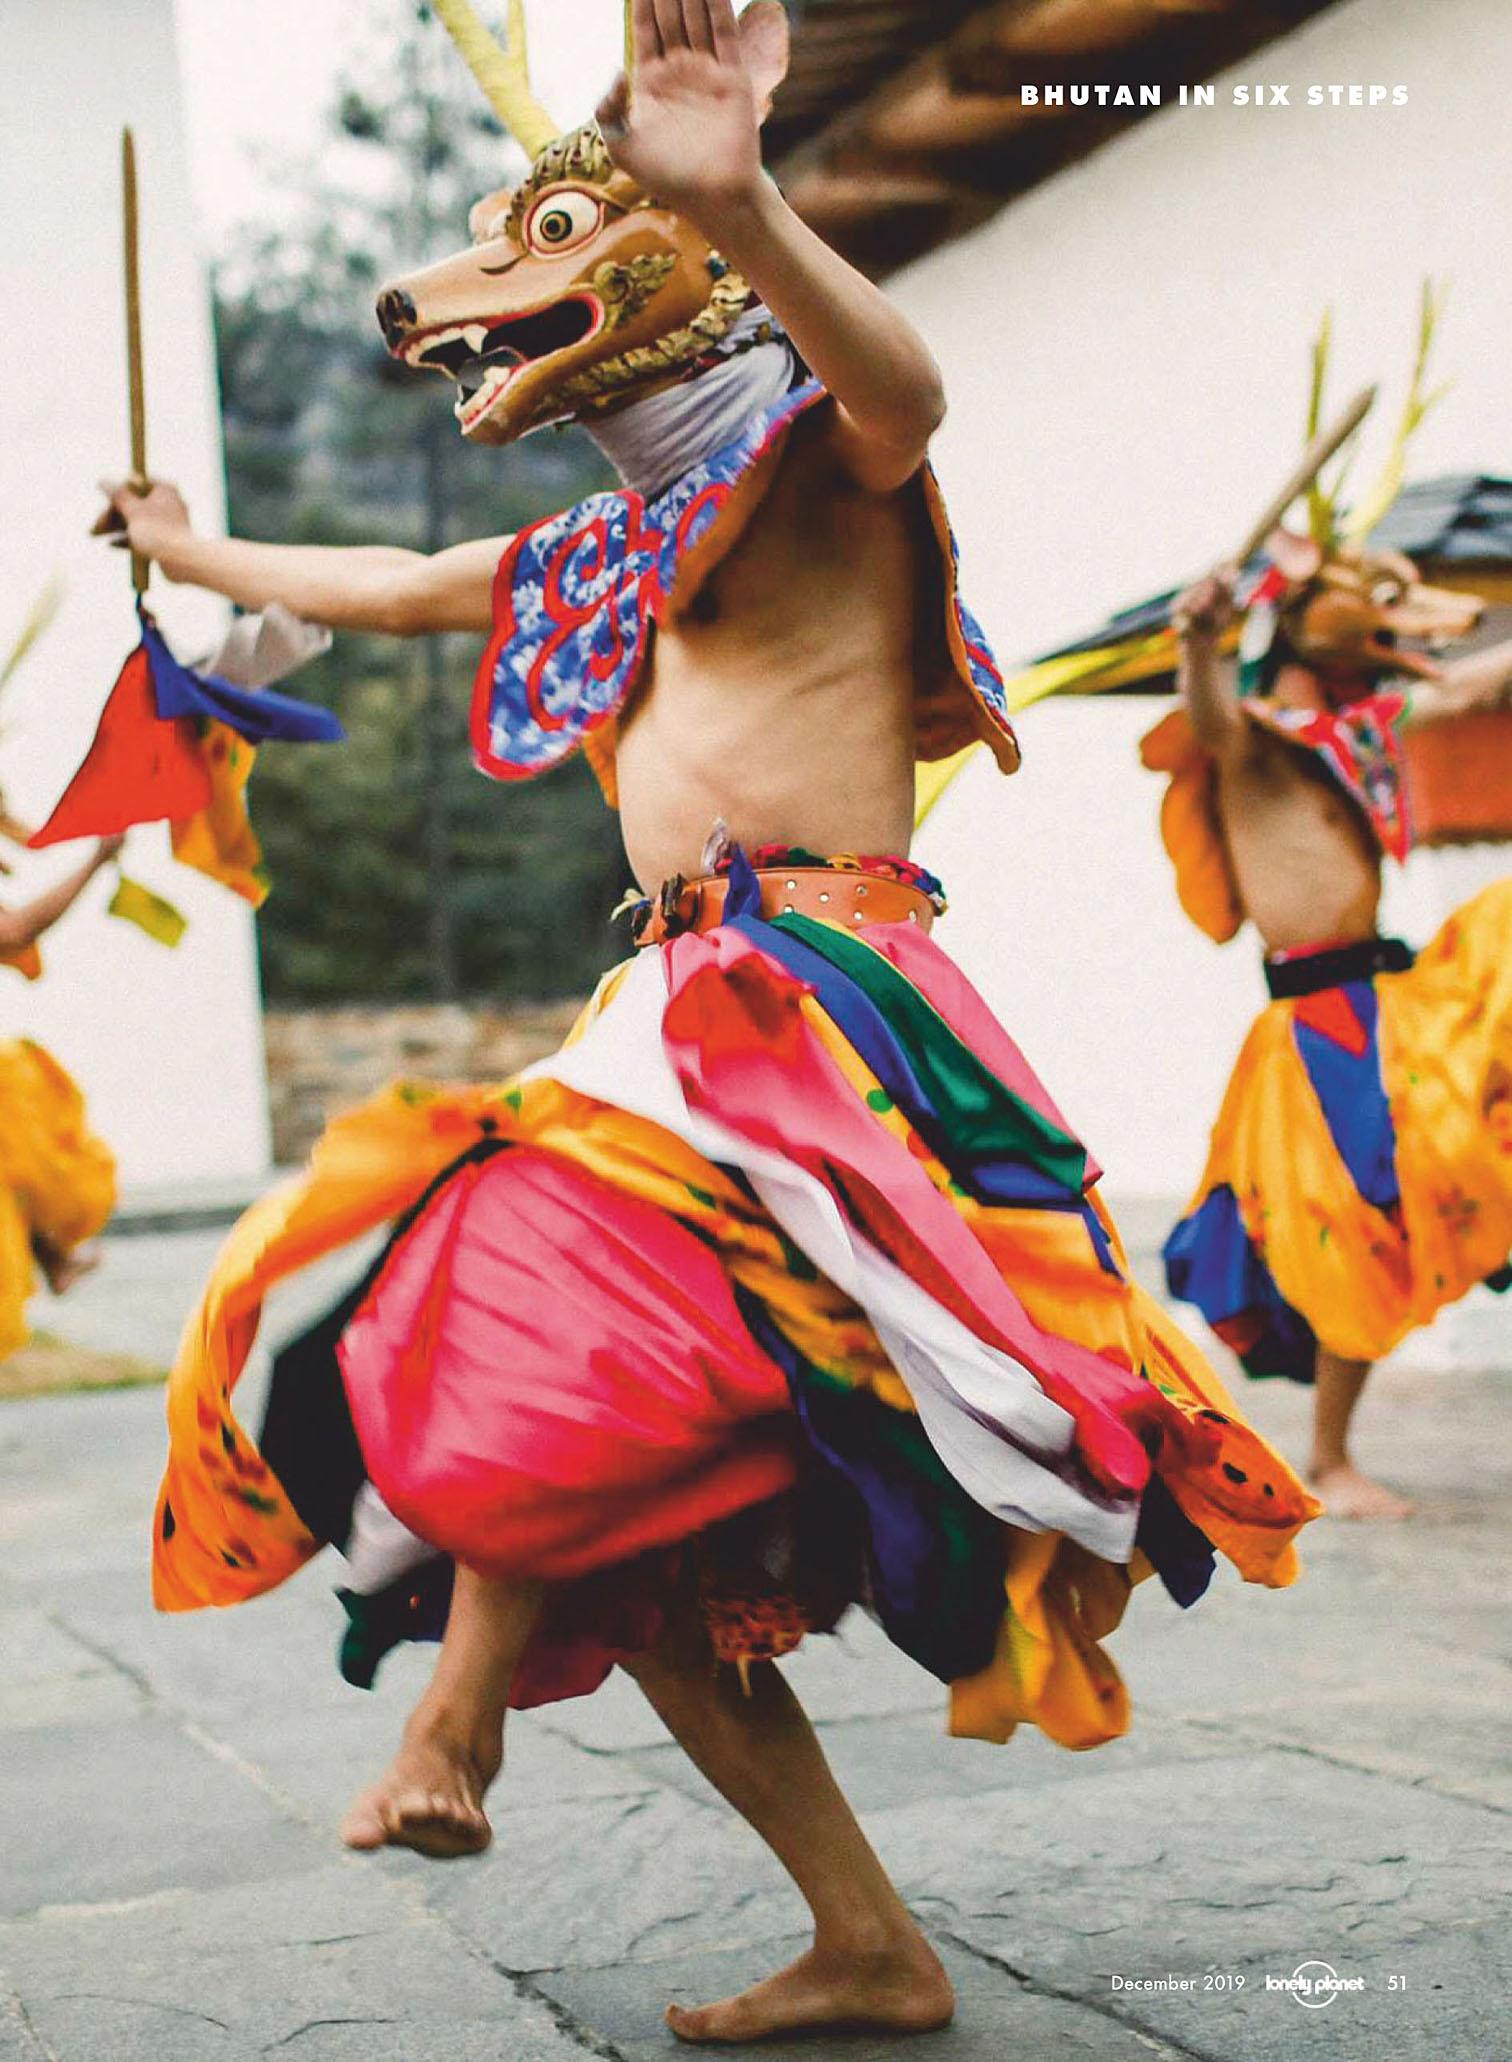 LP Traveller UK 2019-12 Bhutan 09.jpg